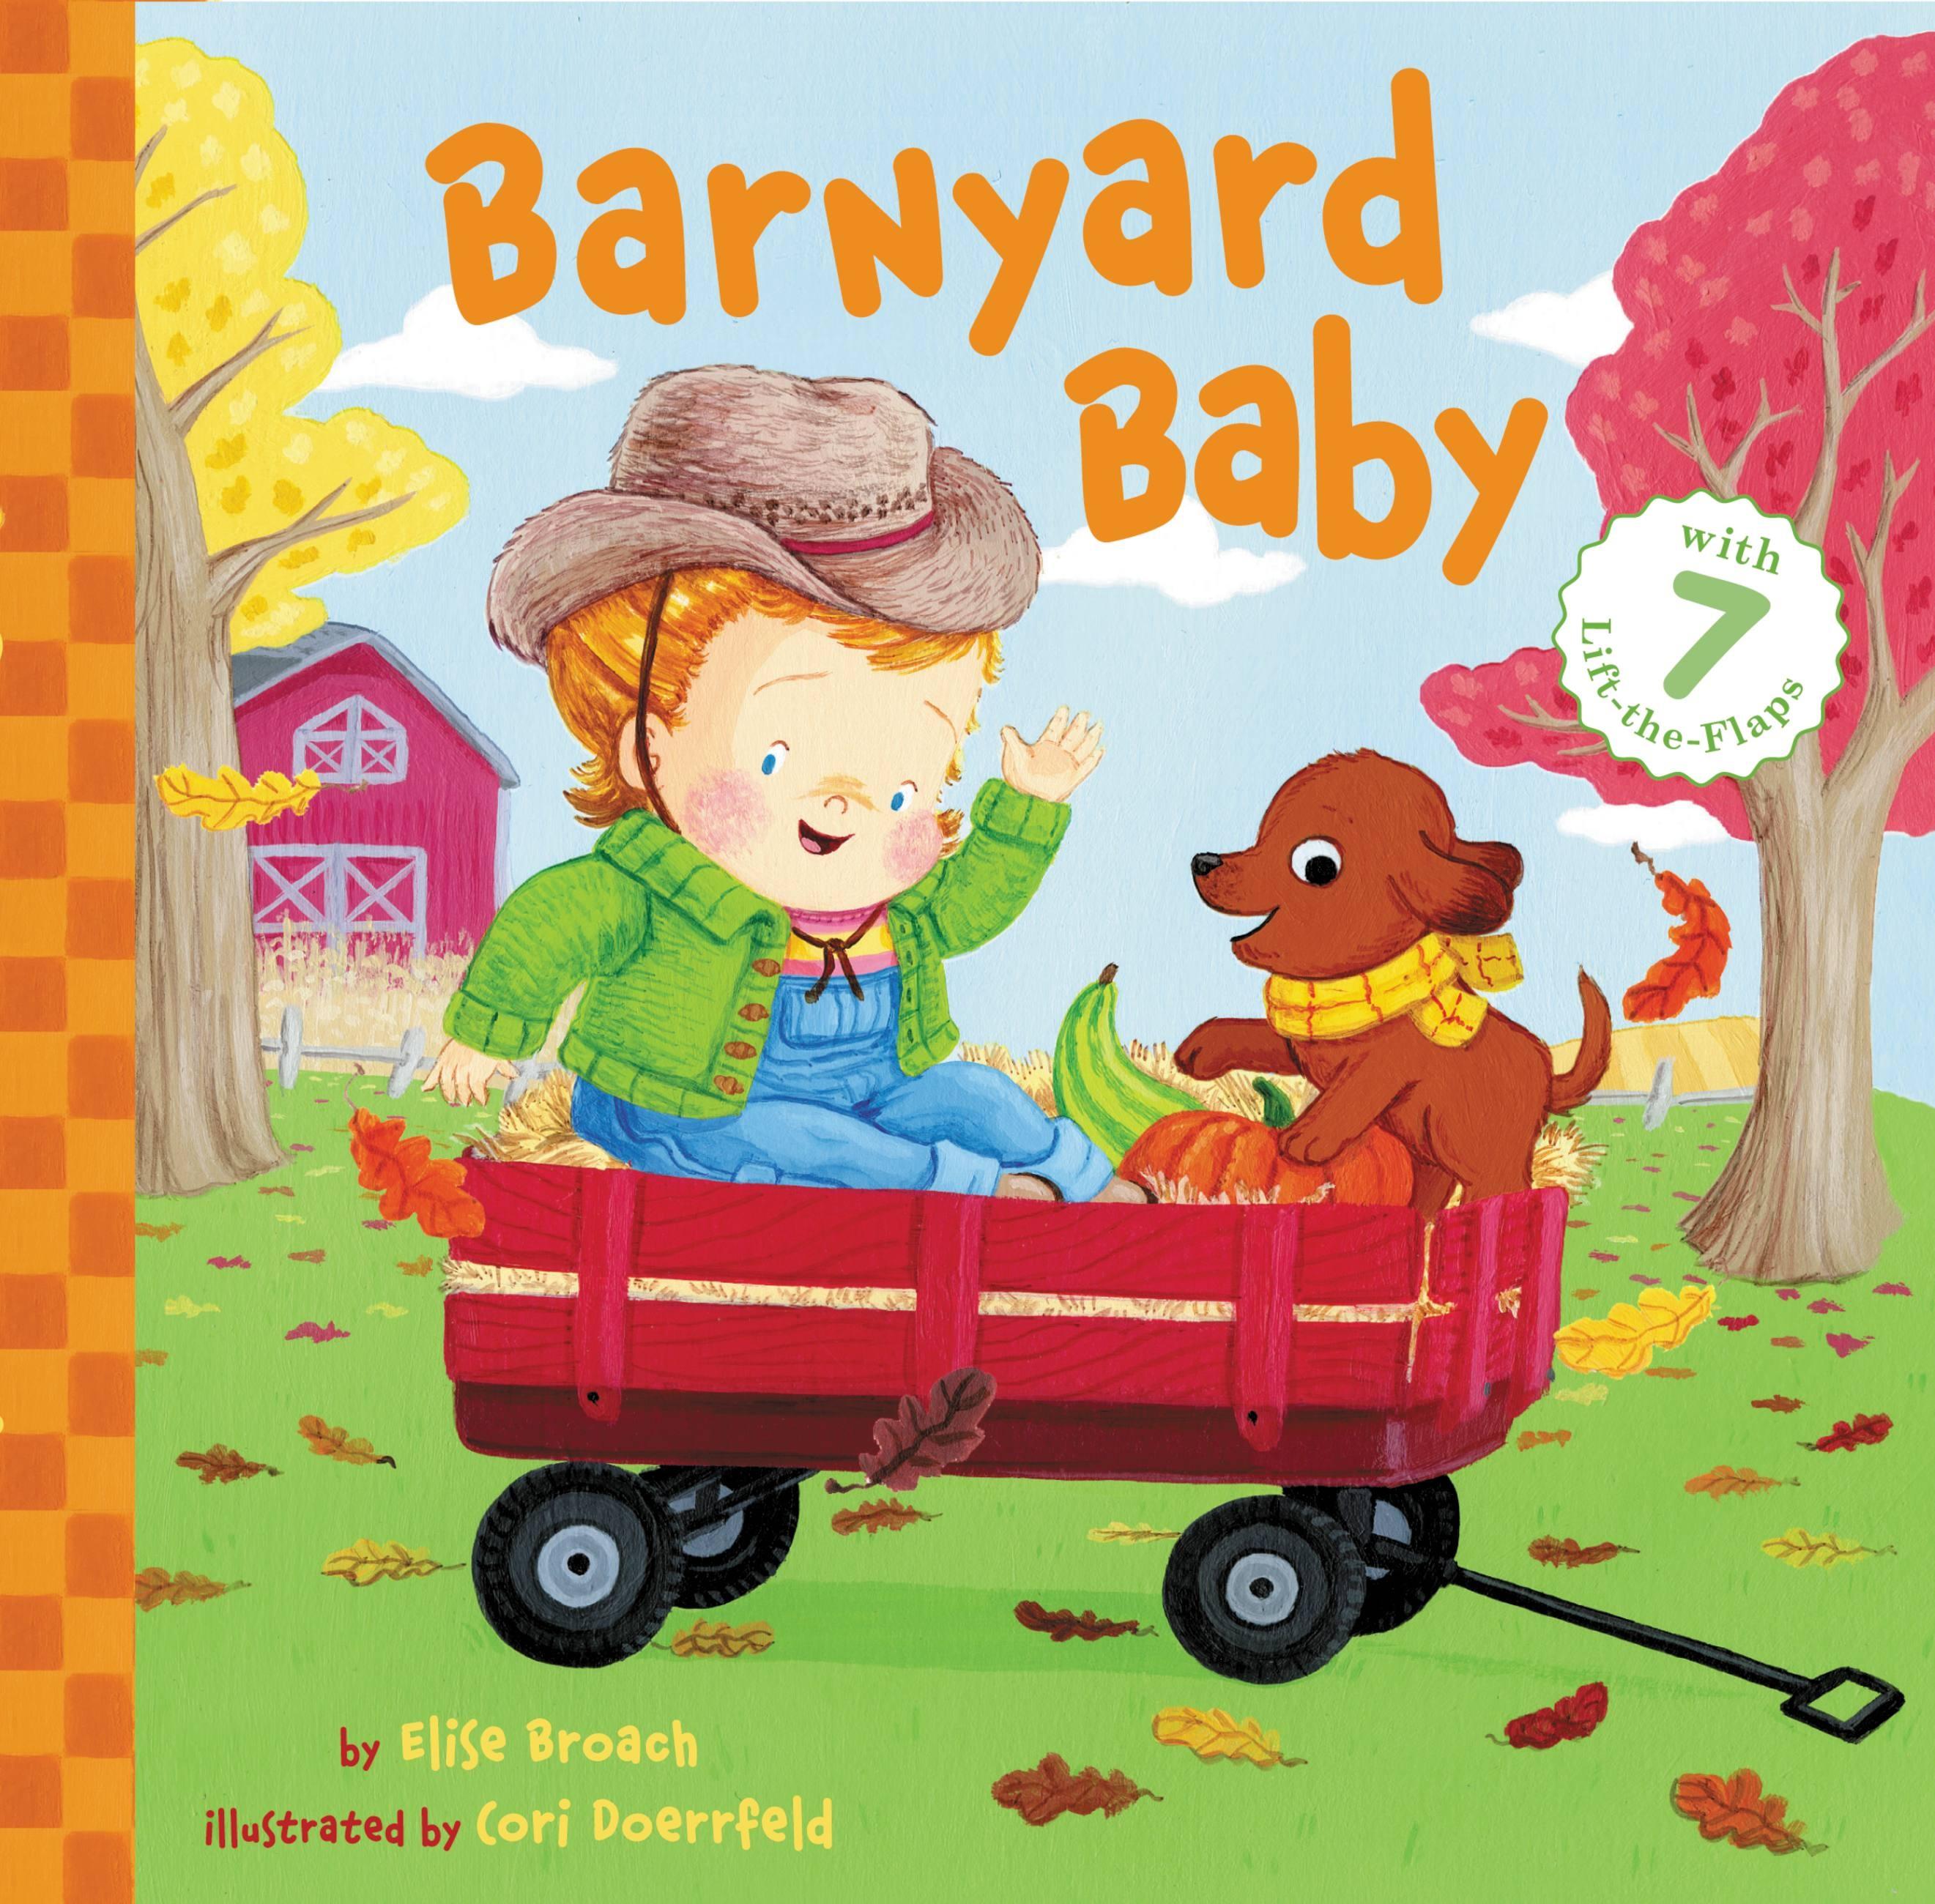 Barnyard Baby by Elise Broach | Hachette Book Group